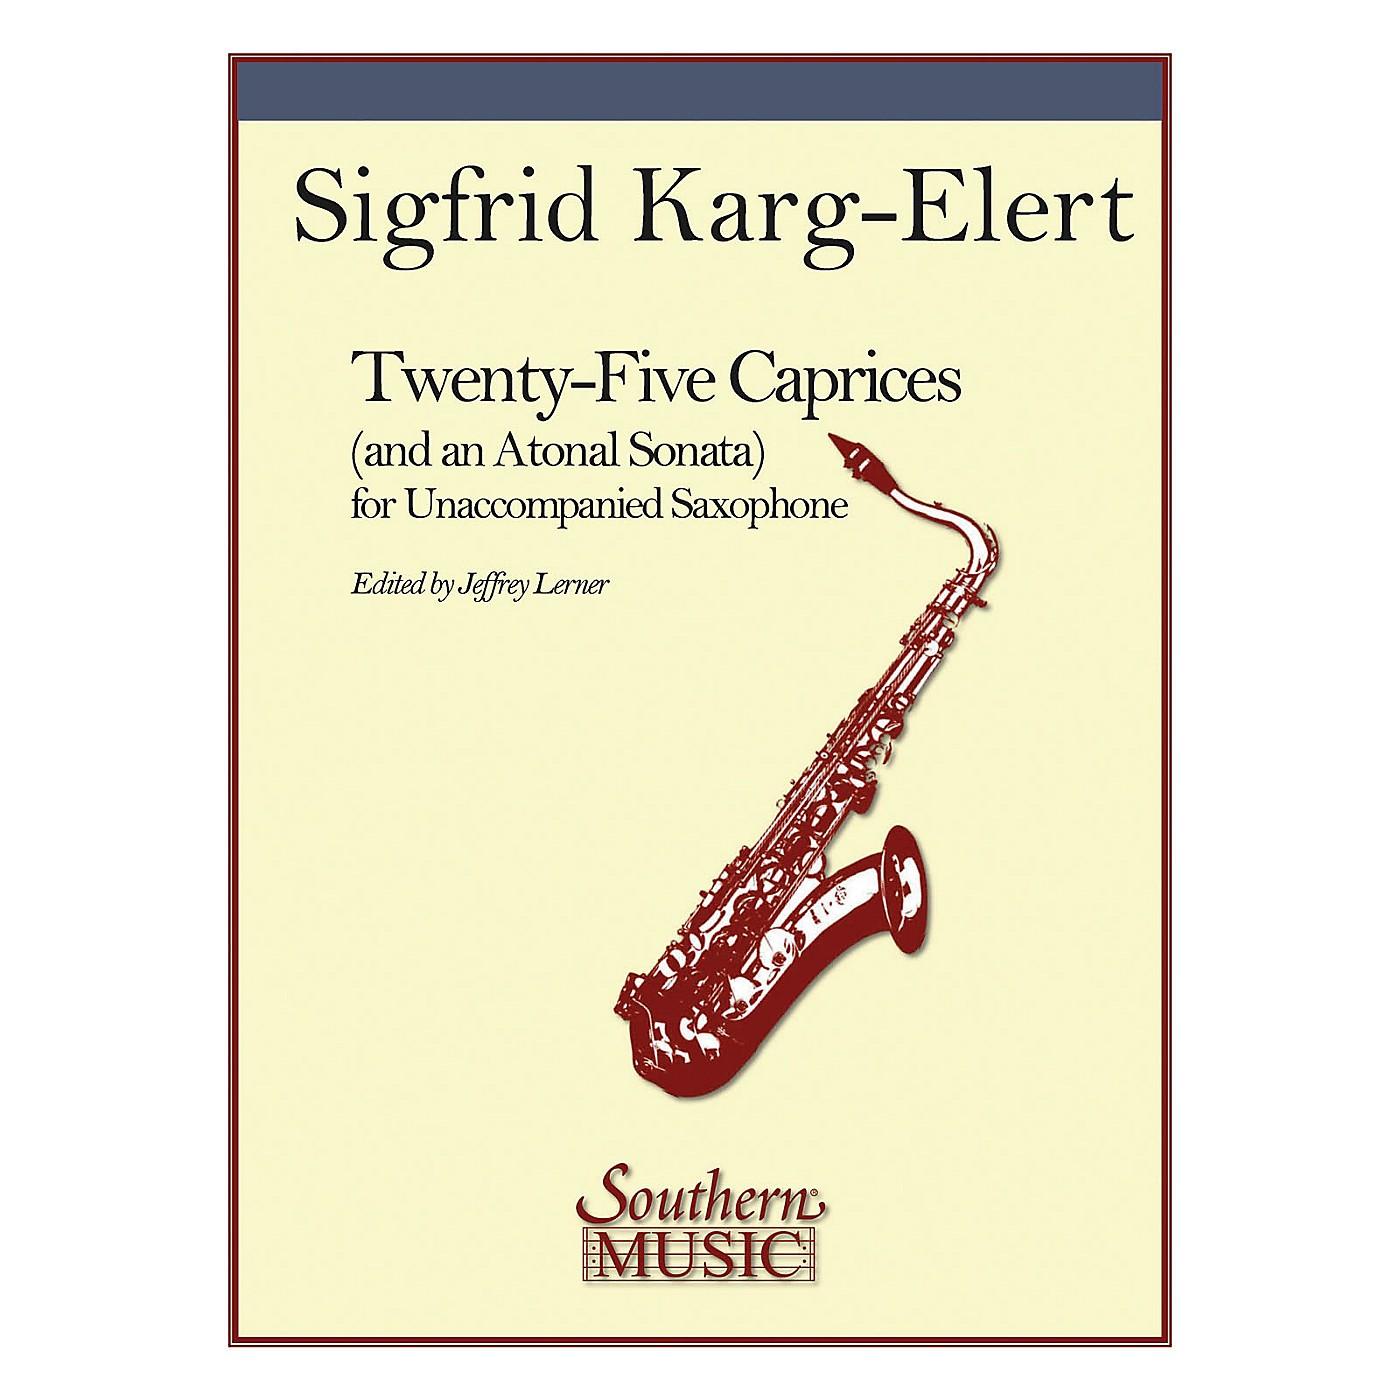 Southern 25 Caprices and an Atonal Sonata (Unaccompanied Saxophone) Southern Music Series by Jeffrey Lerner thumbnail